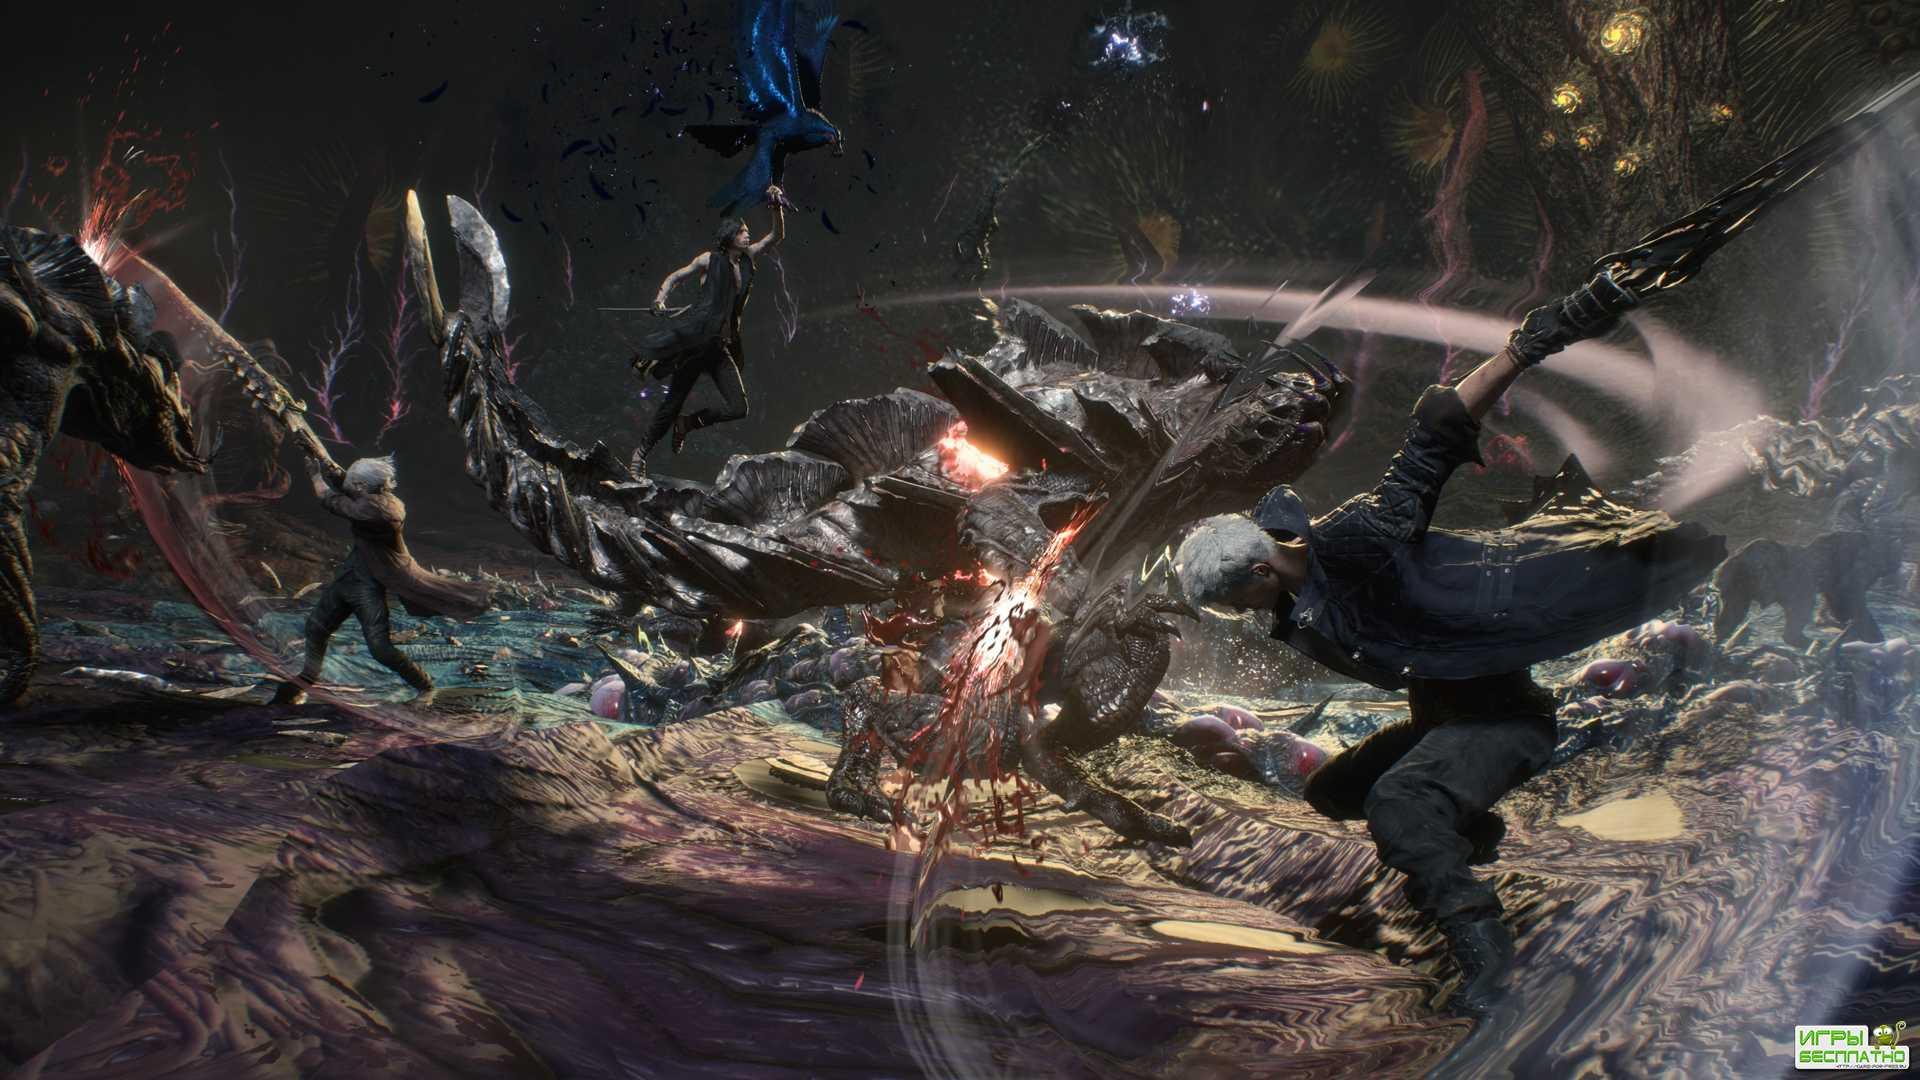 Скоро в Devil May Cry 5 дадут поиграть за известного персонажа серии